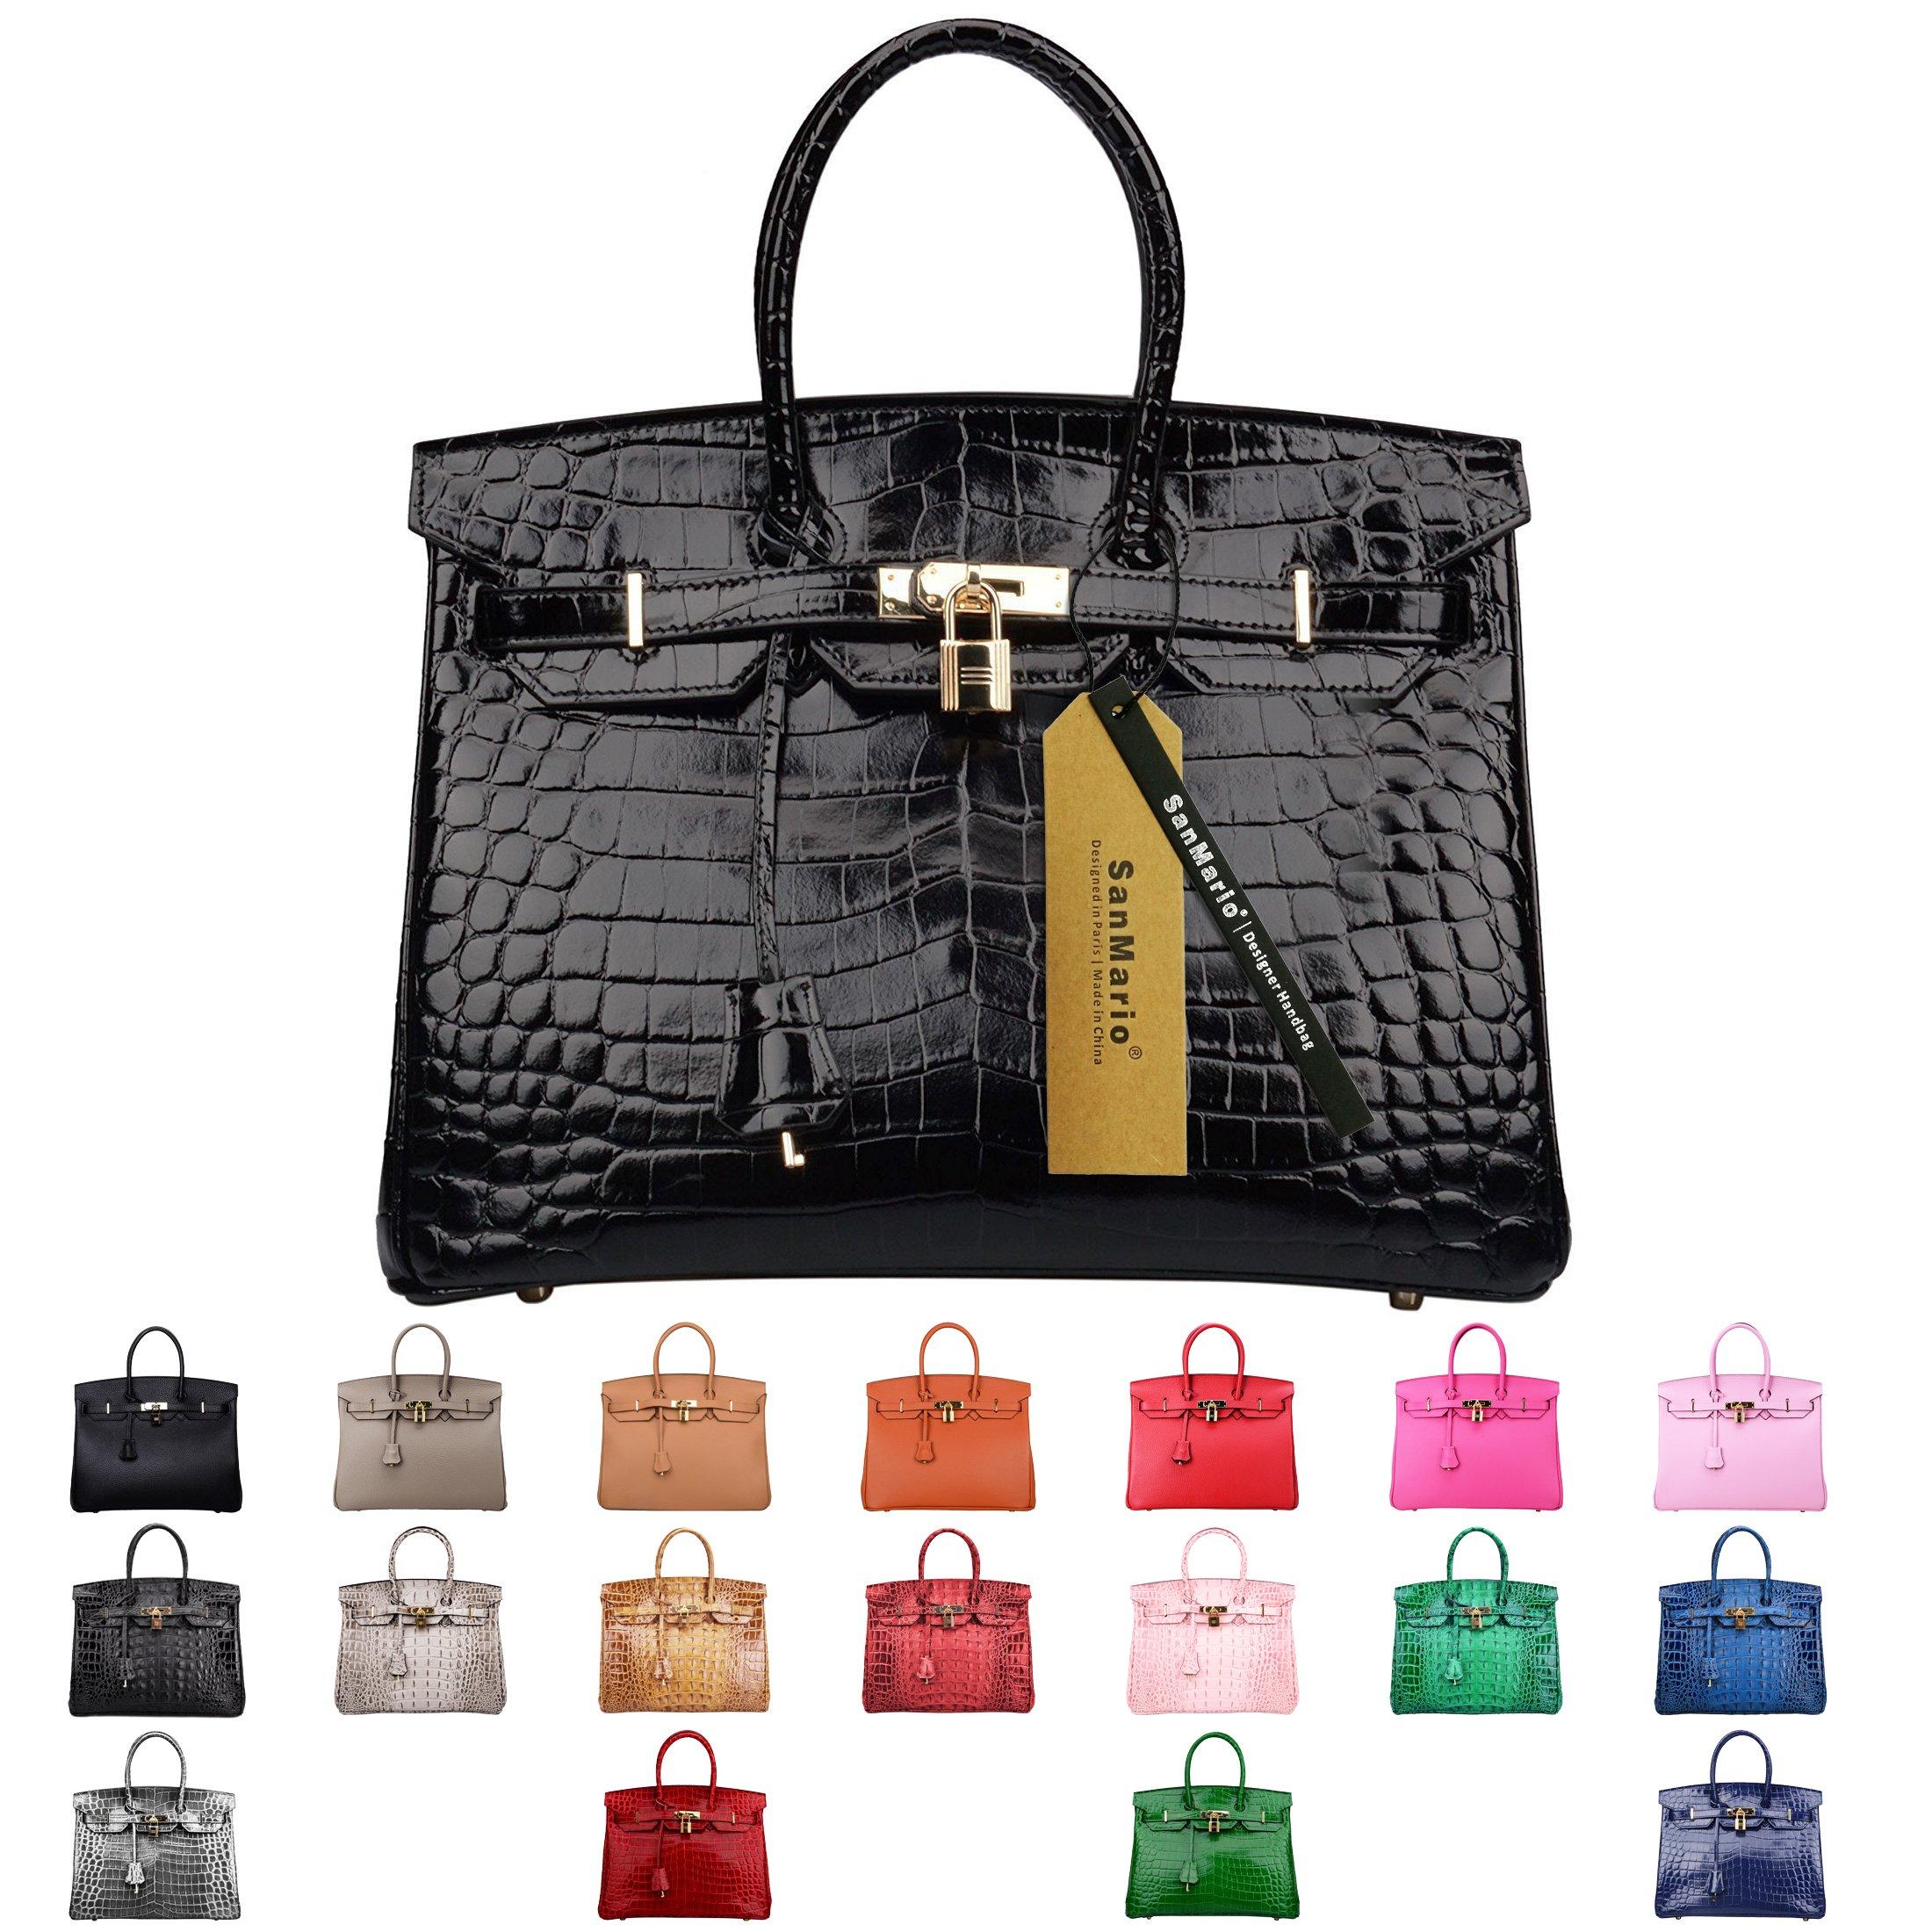 SanMario Designer Handbag Top Handle Padlock Women's Leather Bag Crocodile's Skin Patterns Embossed with Golden Hardware Black 35cm/14''